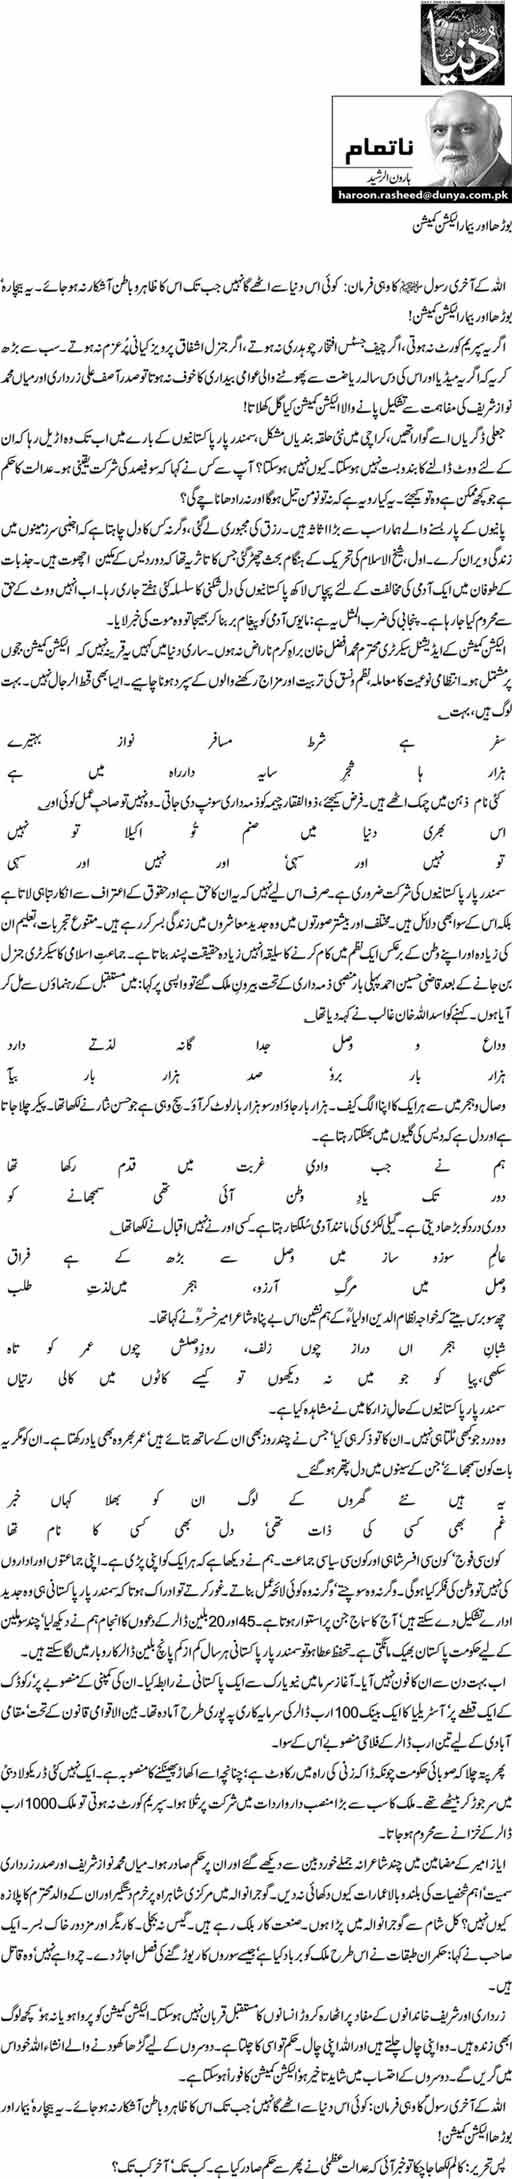 Boorha Aur Bemar Election Commission - Haroon-ur-Rasheed